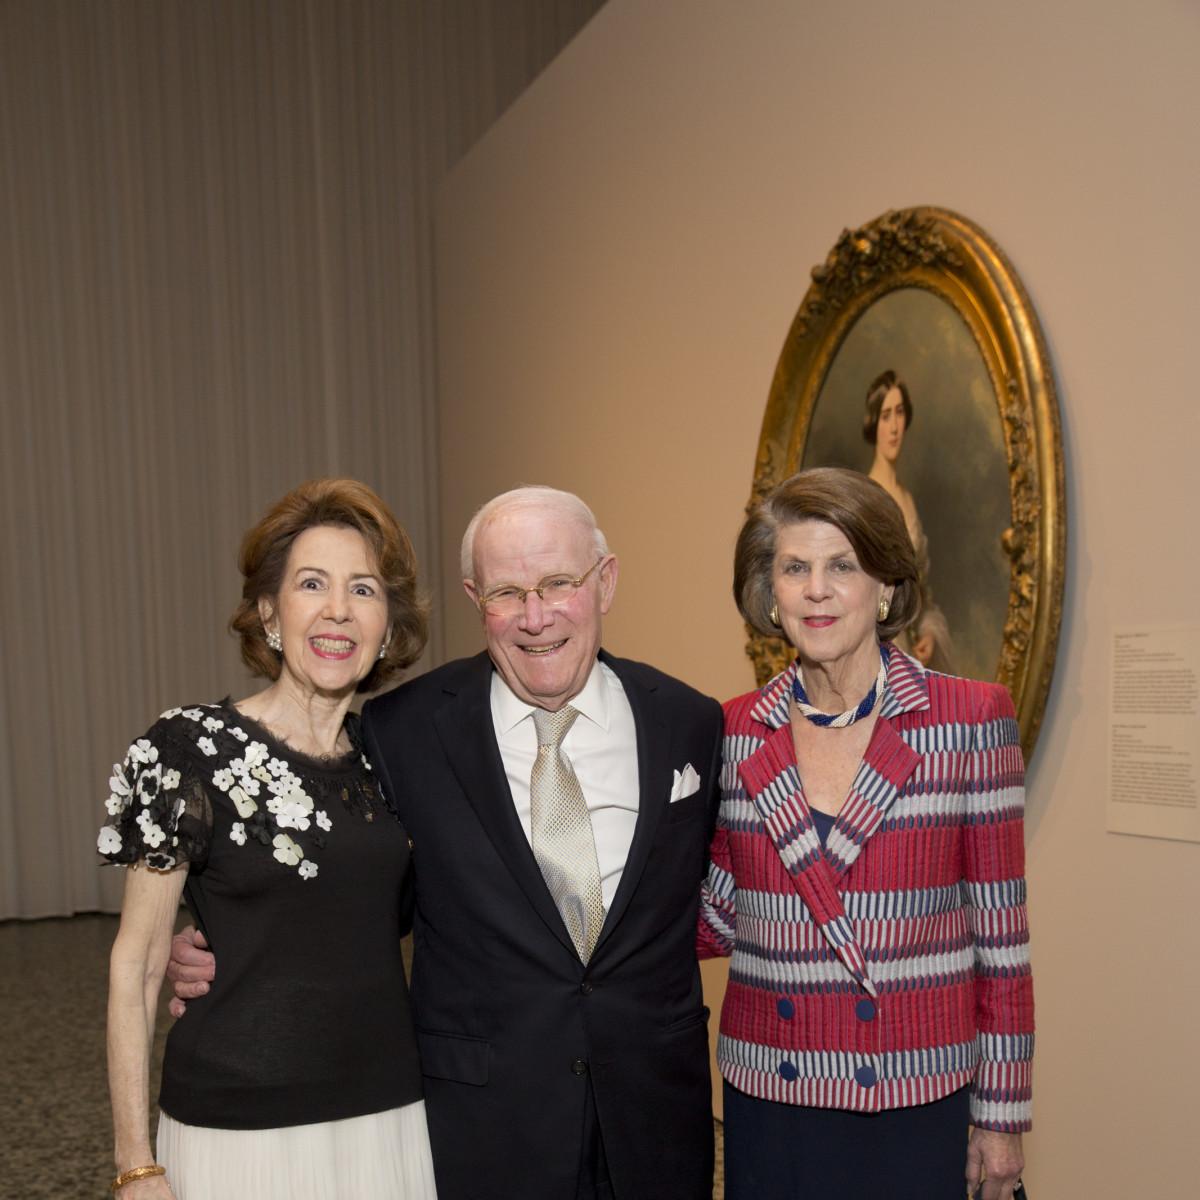 MFAH High Society, 4/16, Gail Adler, Rodney Margolis, Judy Margolis